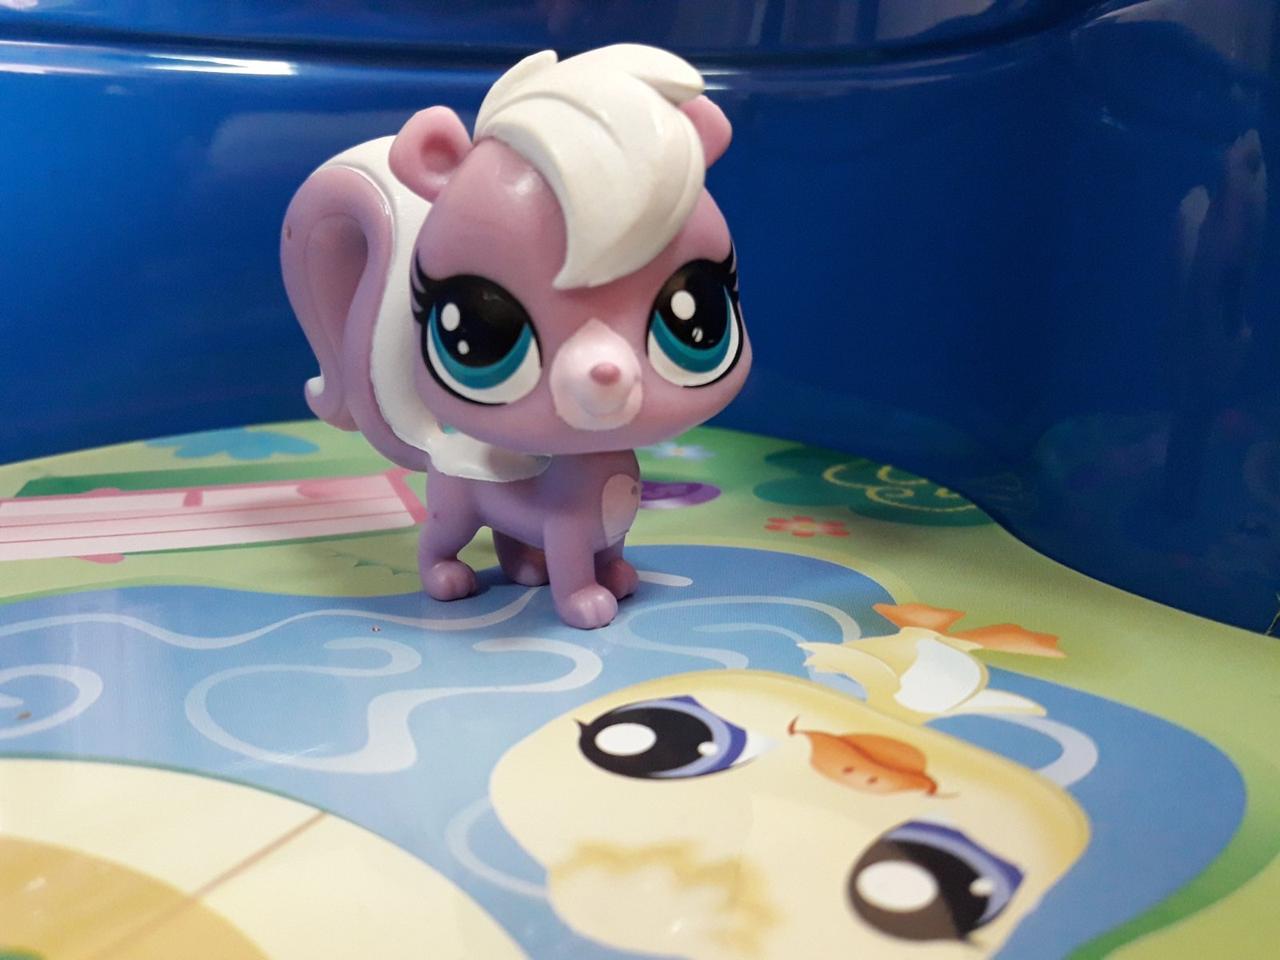 Littlest pet shop lps игрушка Hasbro лпс пет шоп скунс